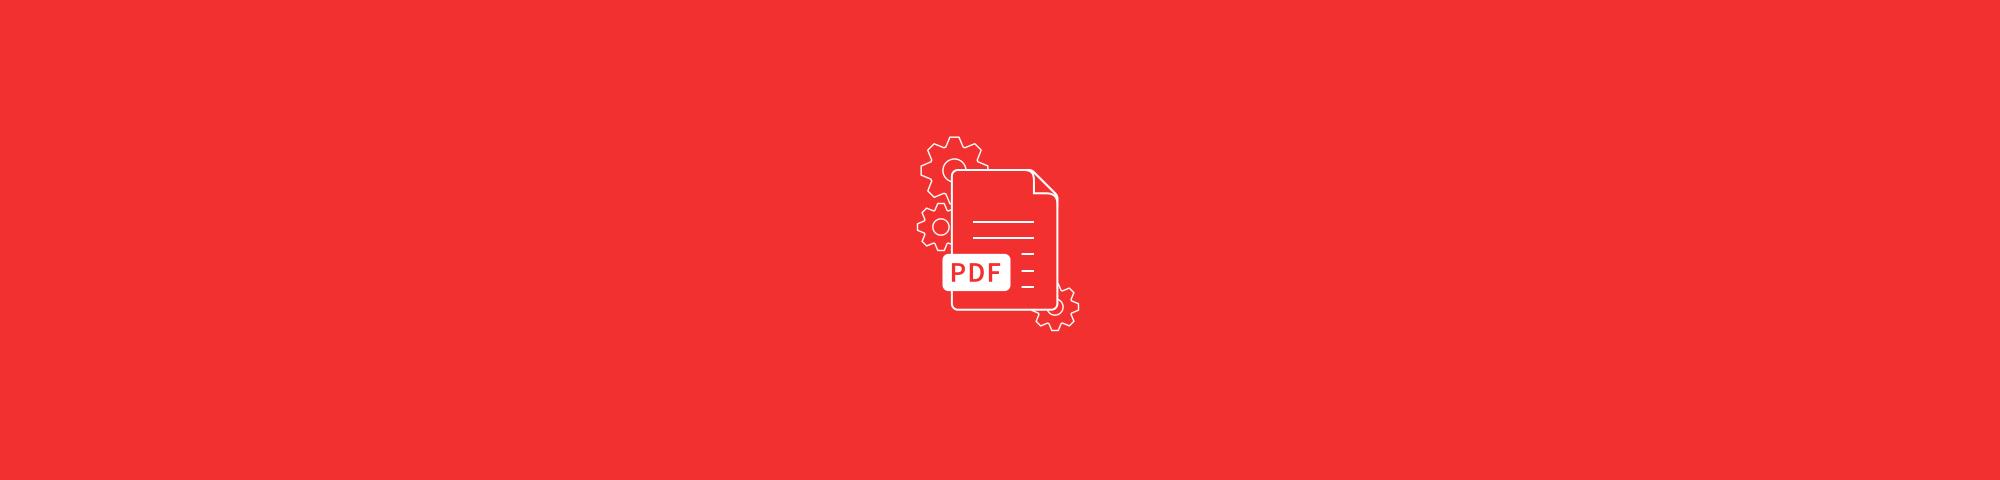 2020-08-06-crear-pdf-online